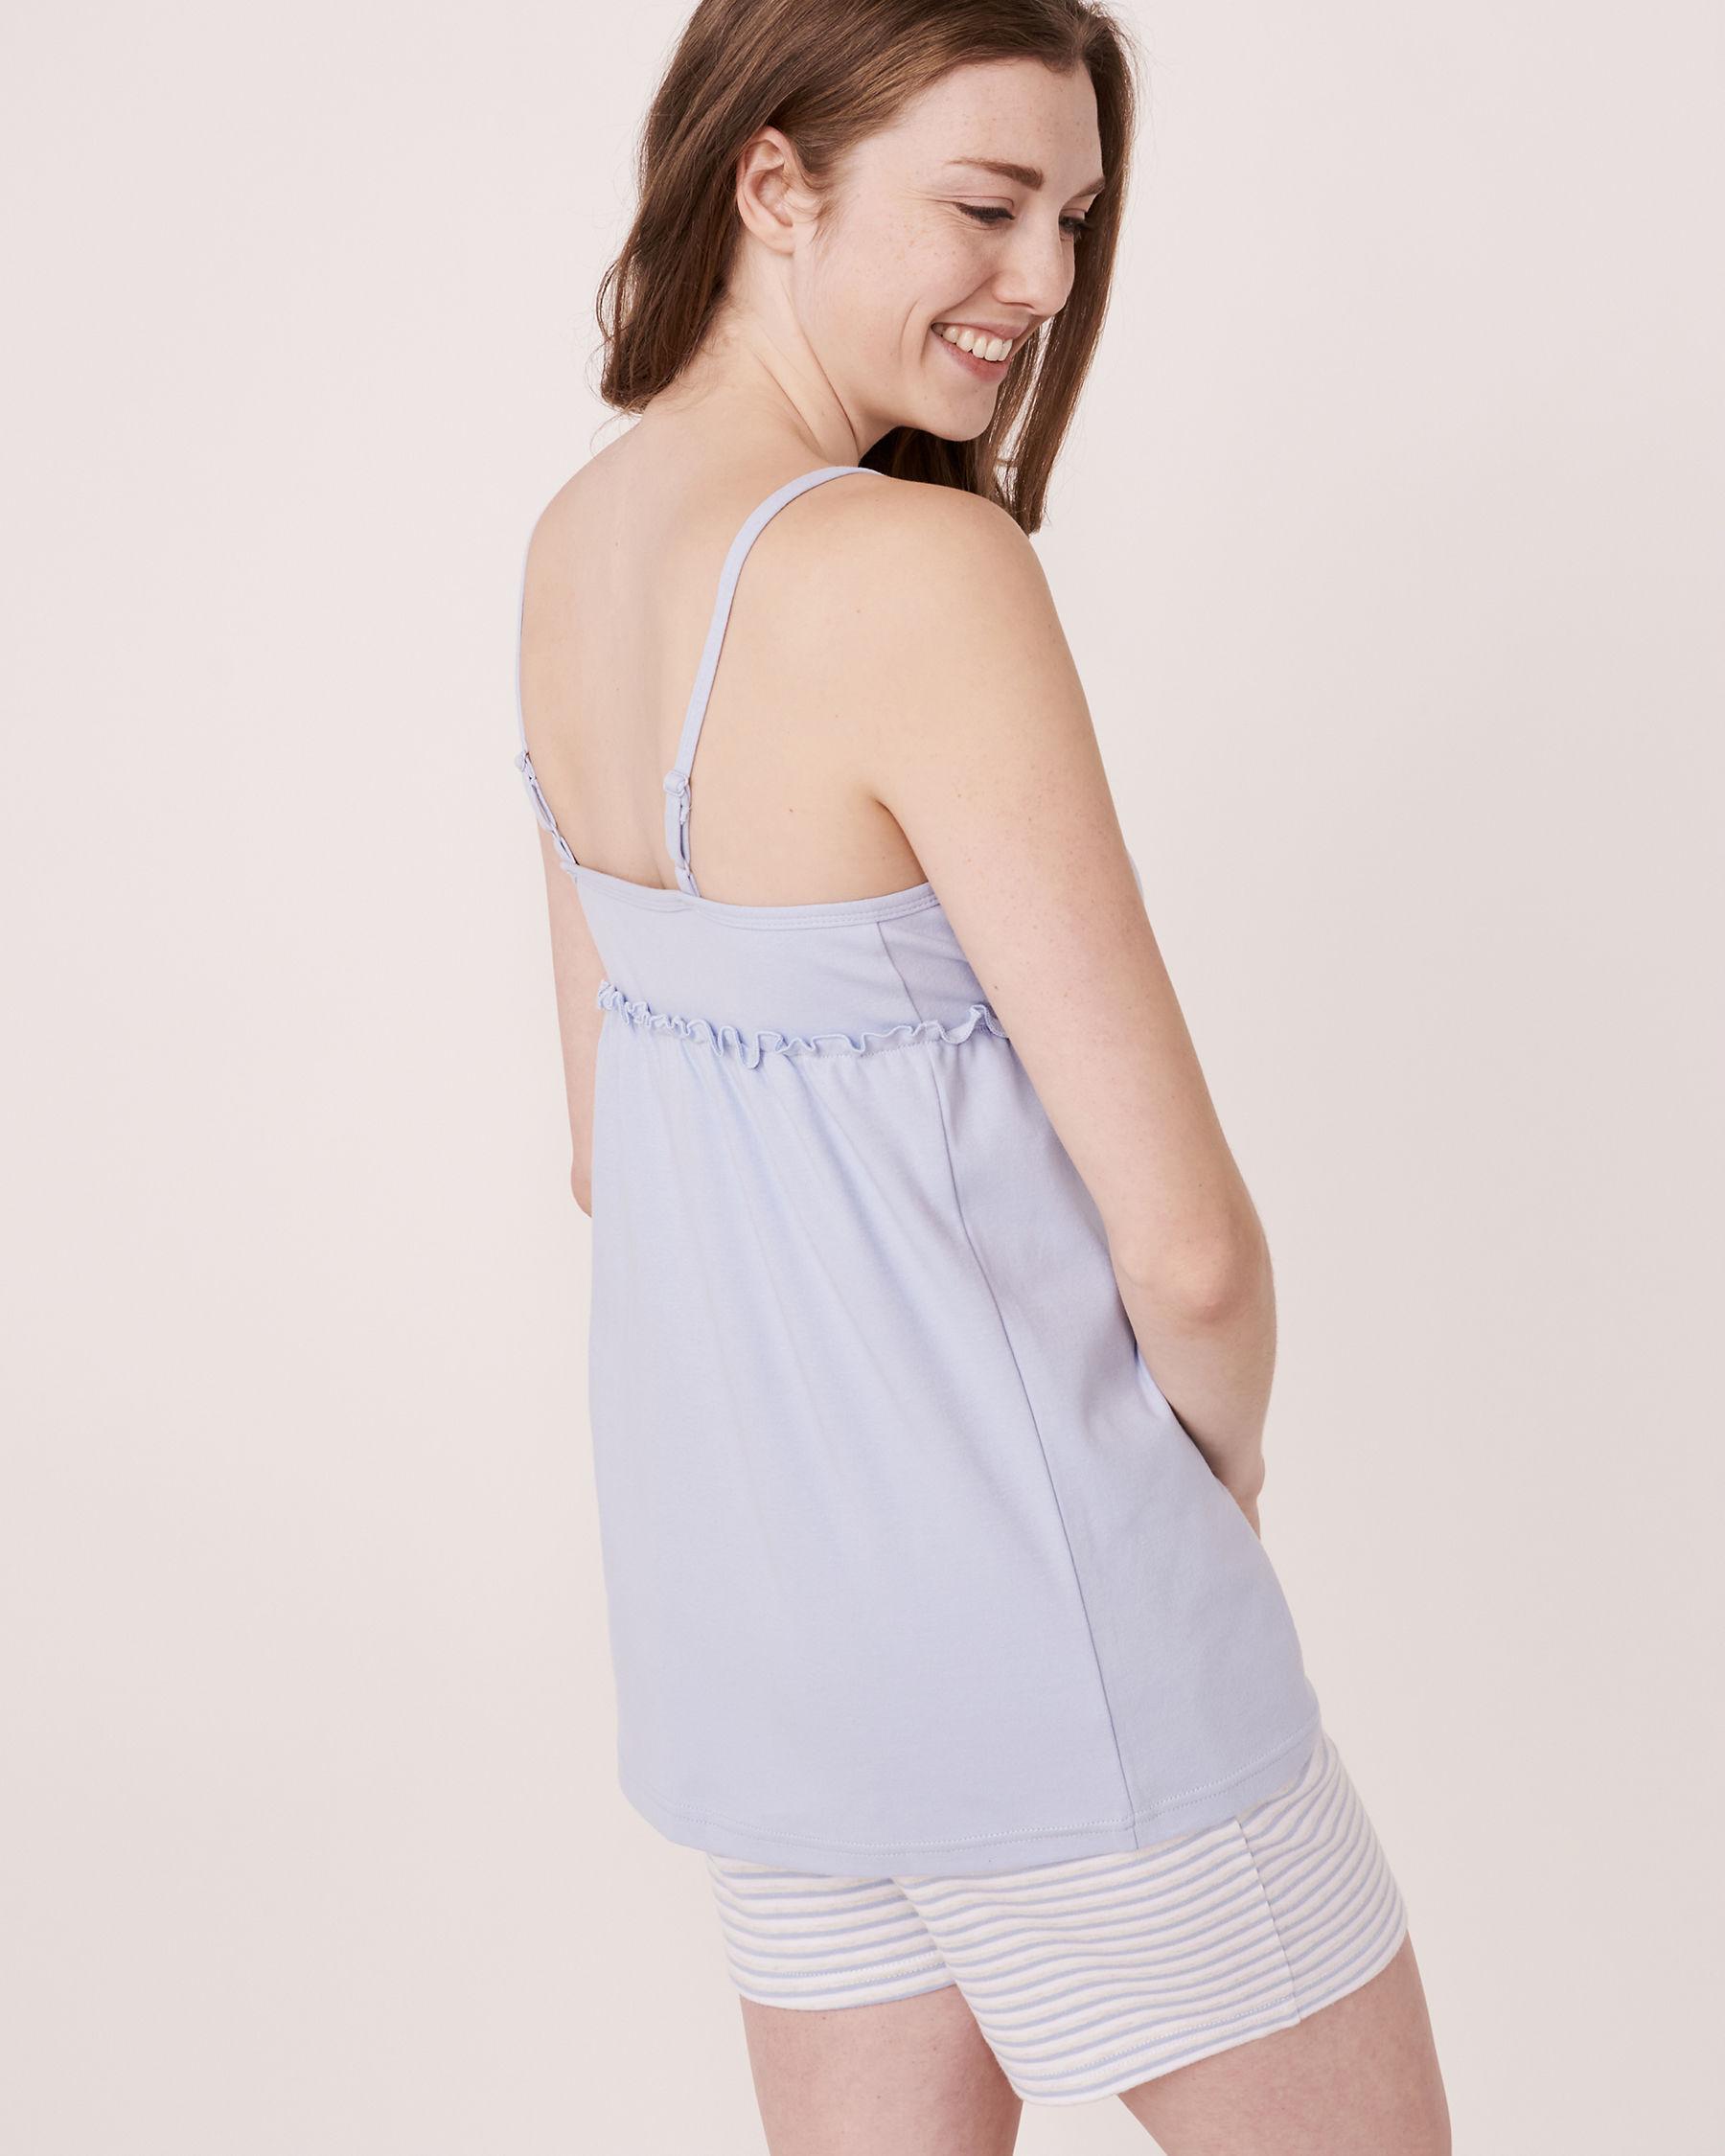 LA VIE EN ROSE Organic Cotton Wrap Cami Blue sky 40100004 - View4